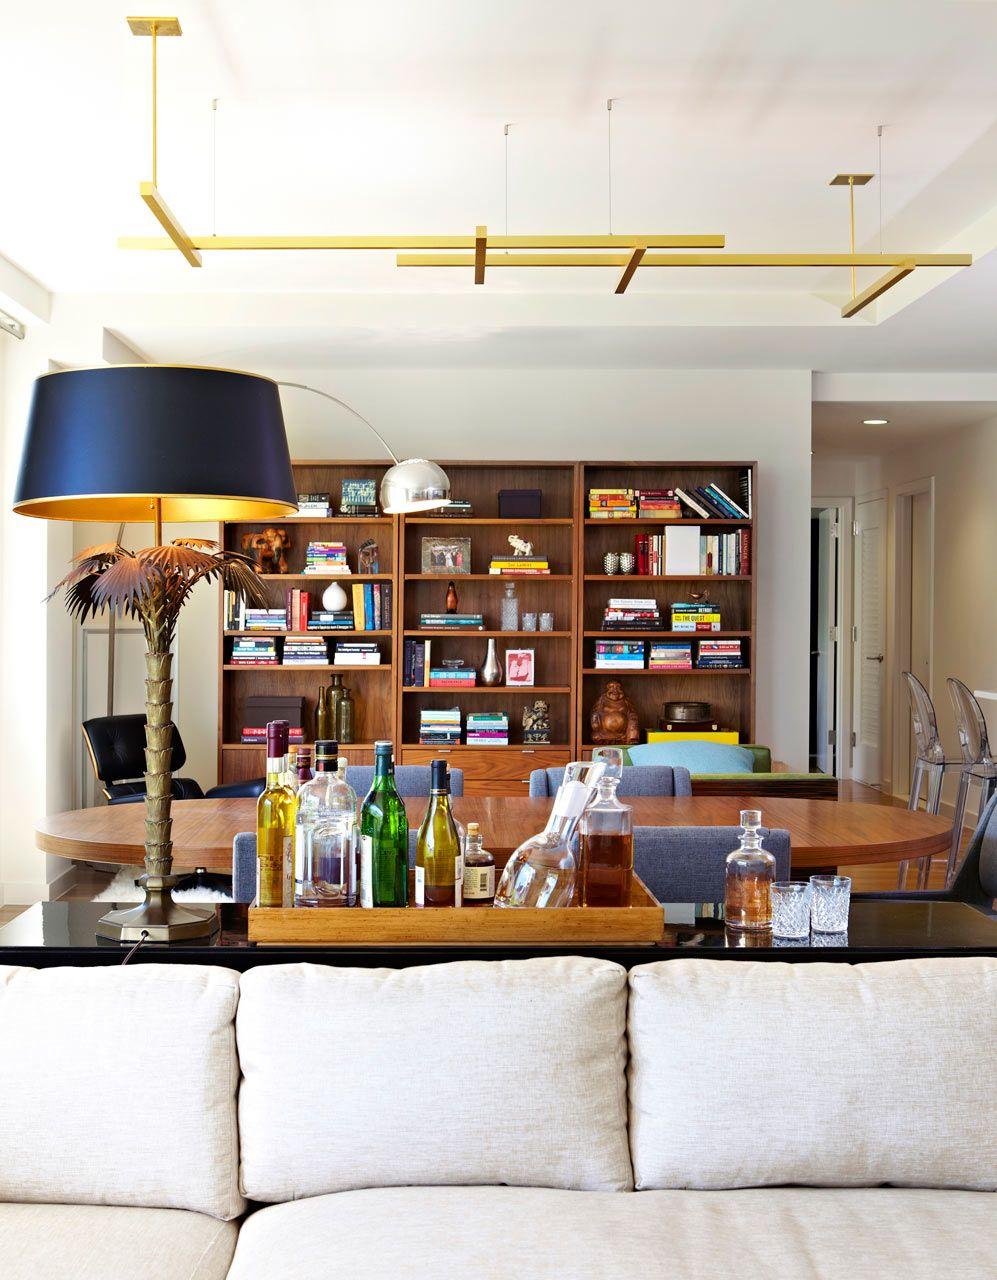 BrooklynApartment810designgroup1 Apartments Interiors and